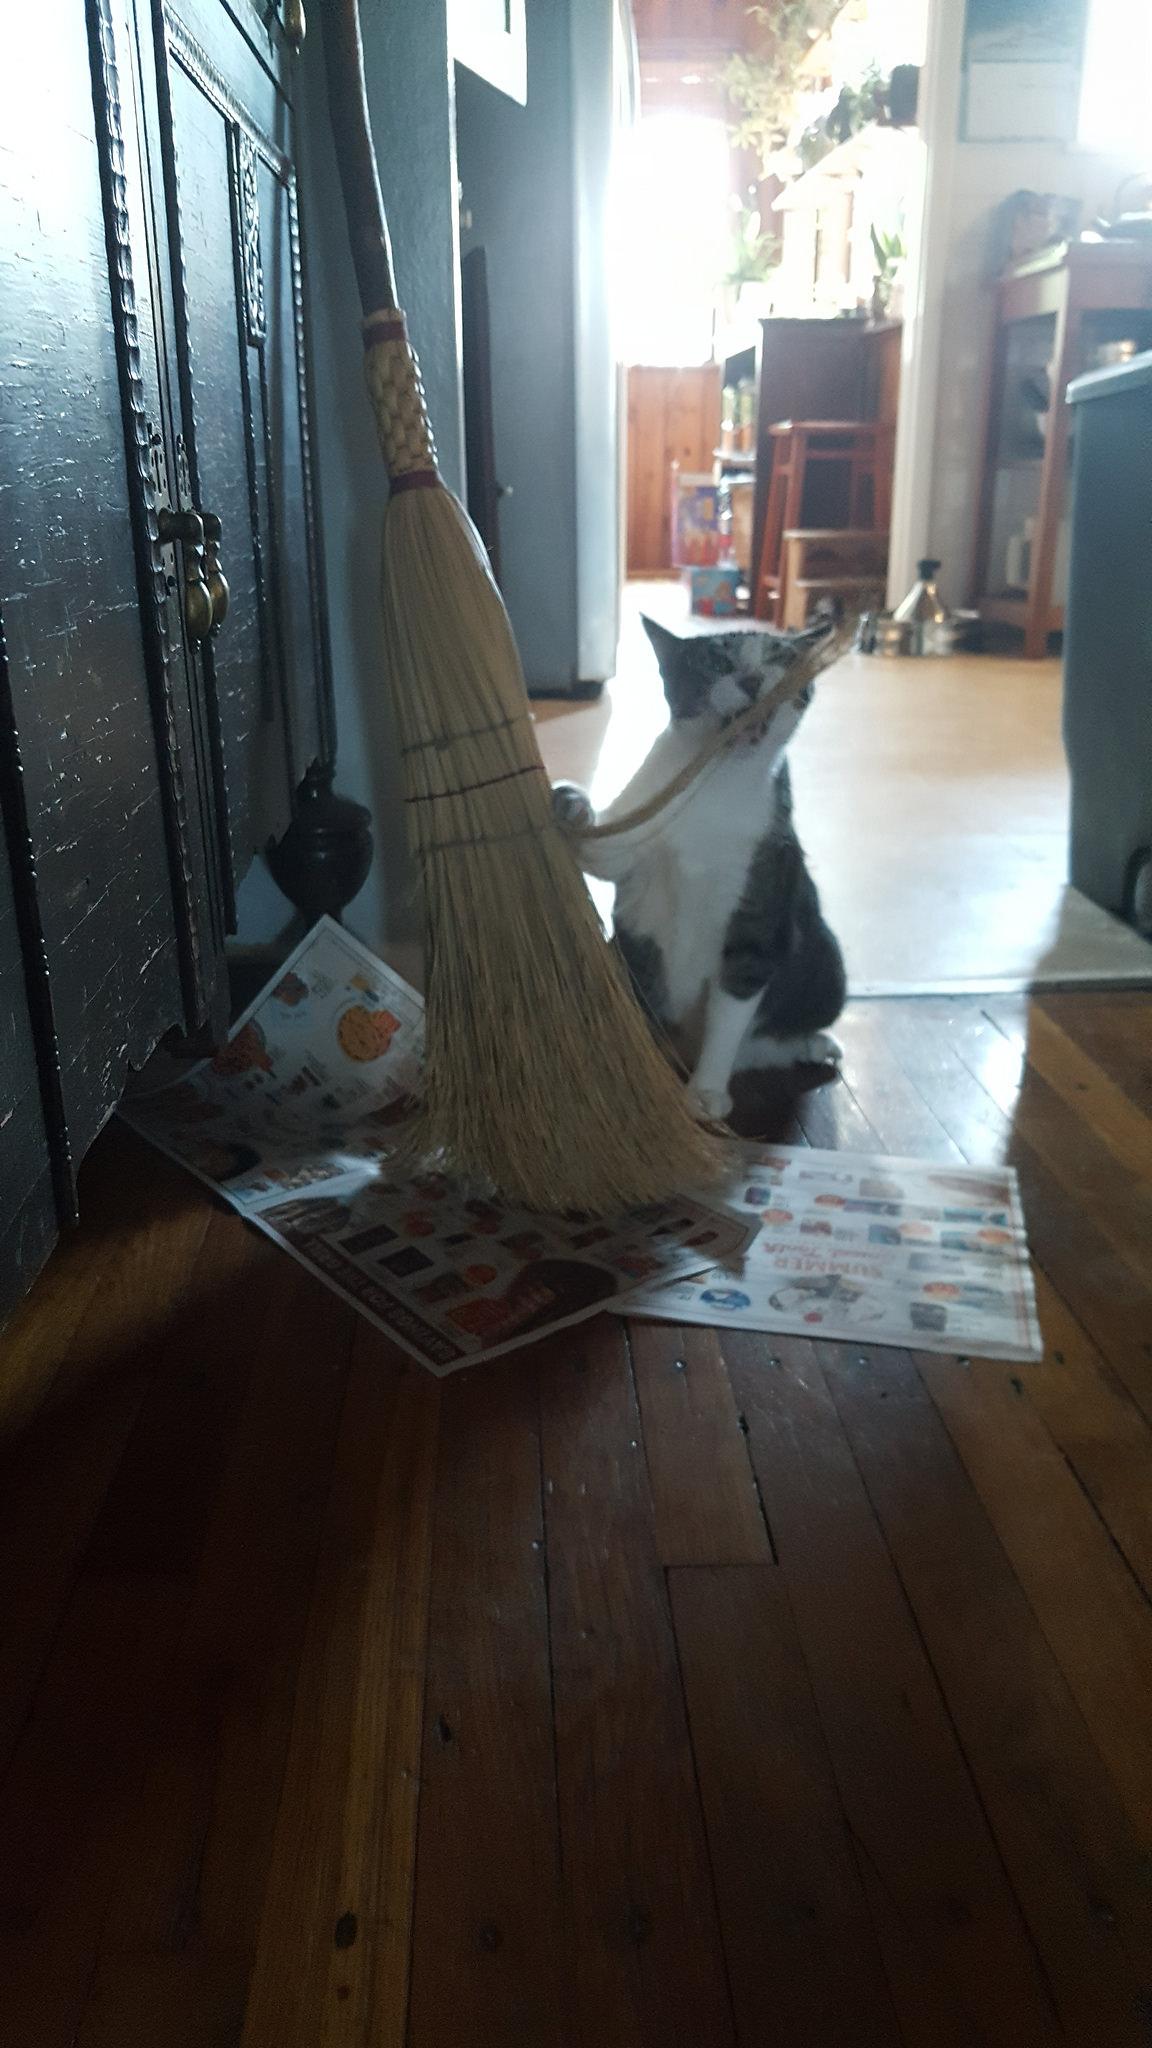 Fuck this broom